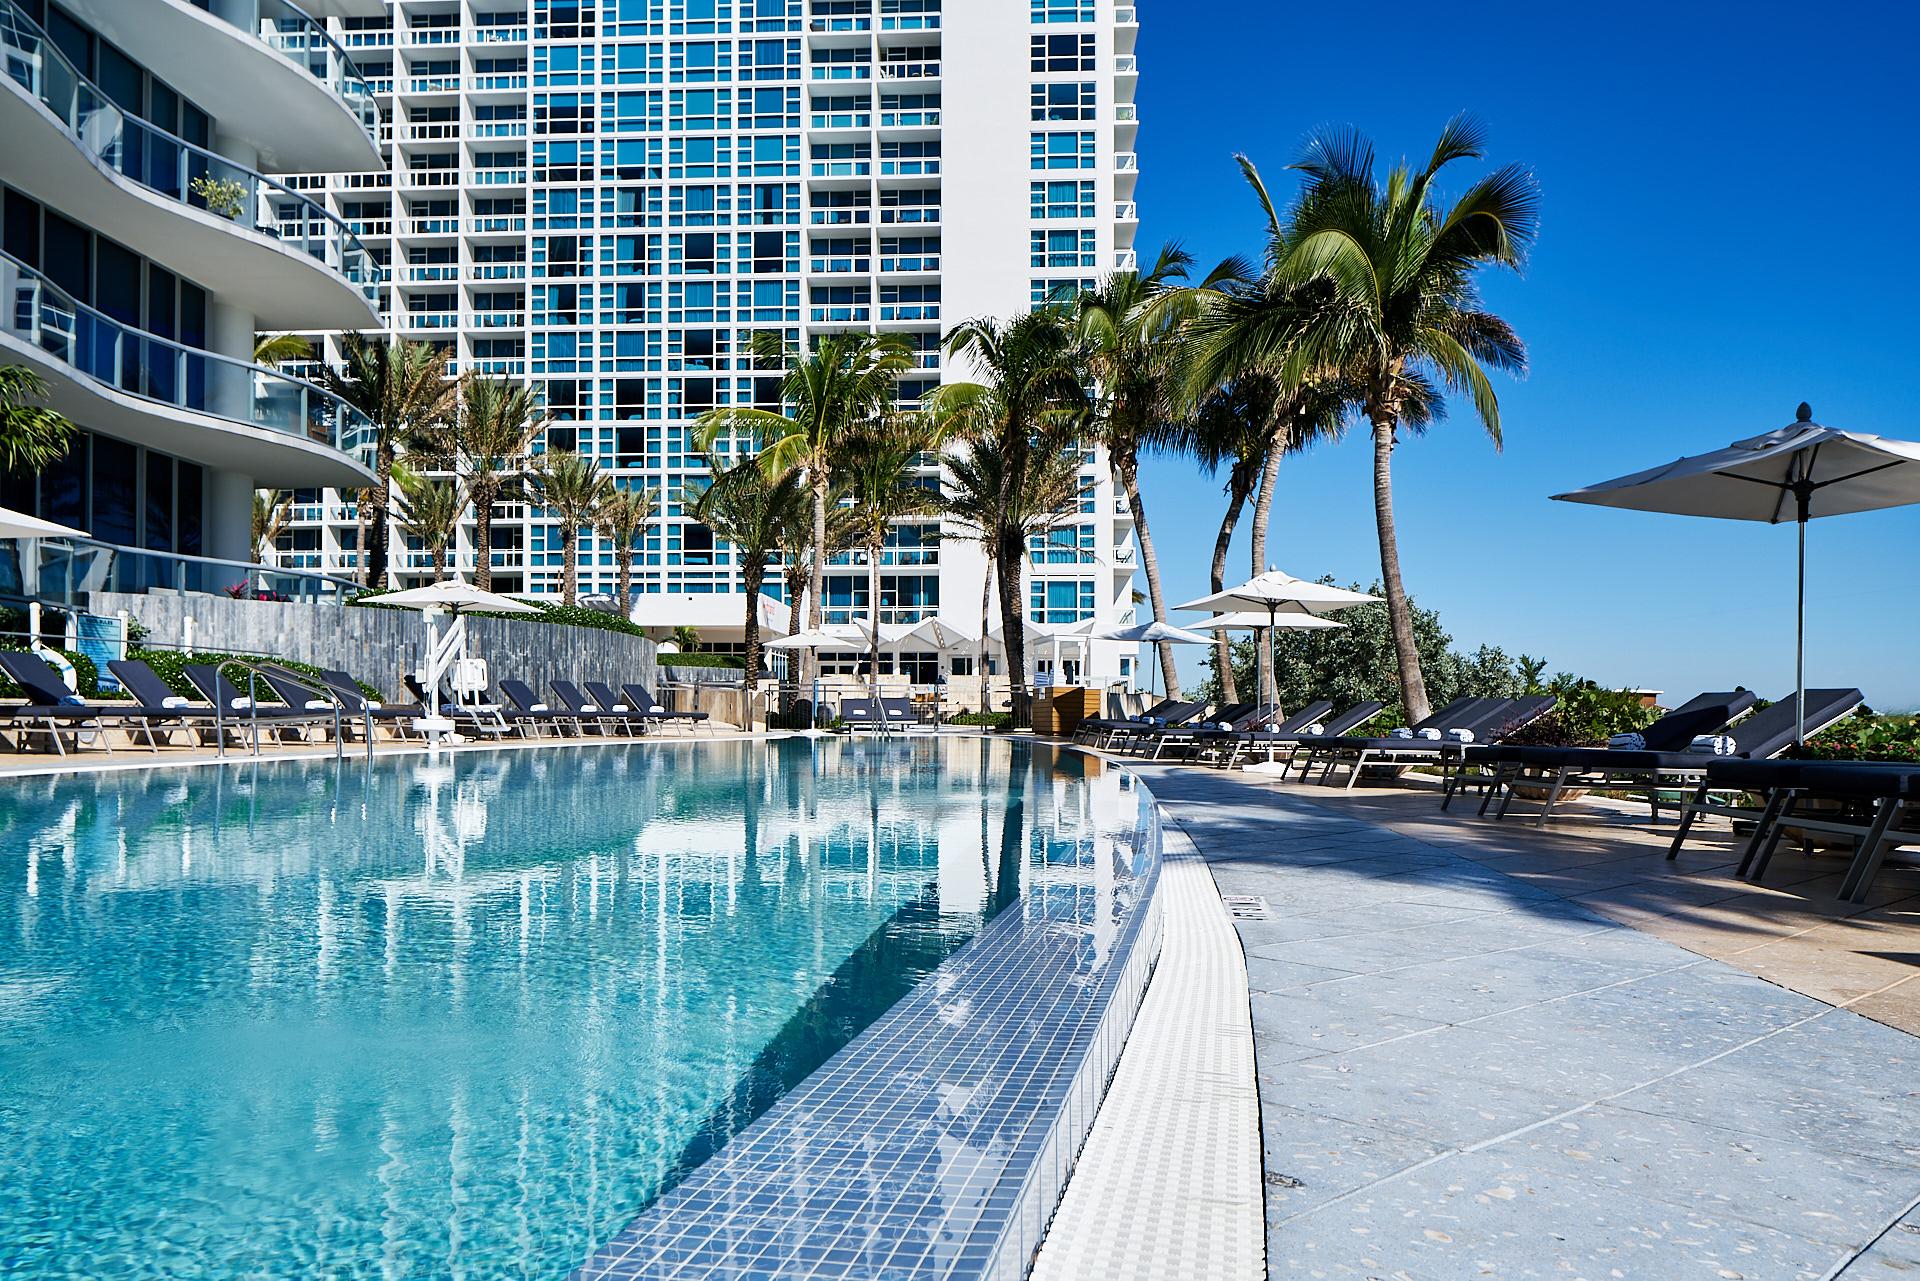 cabana-pool-2.jpg